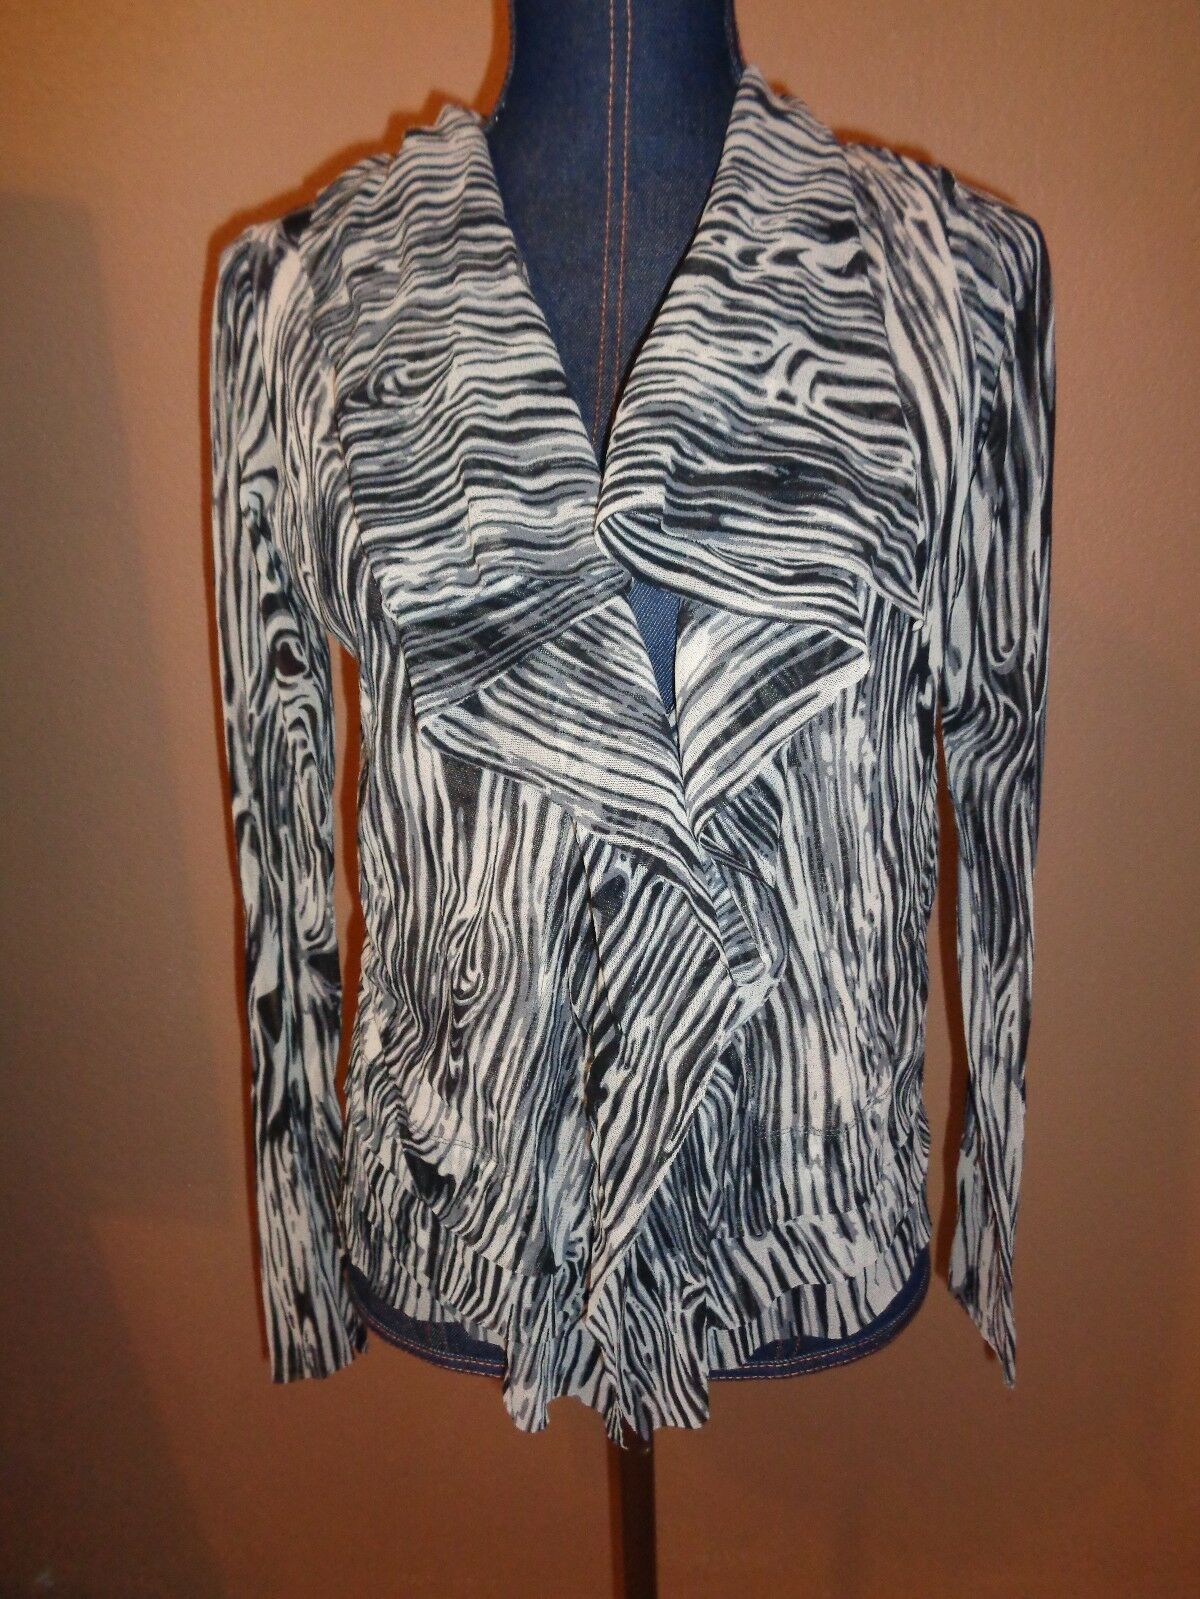 FUZZI S. Giovanni in Marignano Tierot Mesh Nylon Jacket Top Größe M Made in